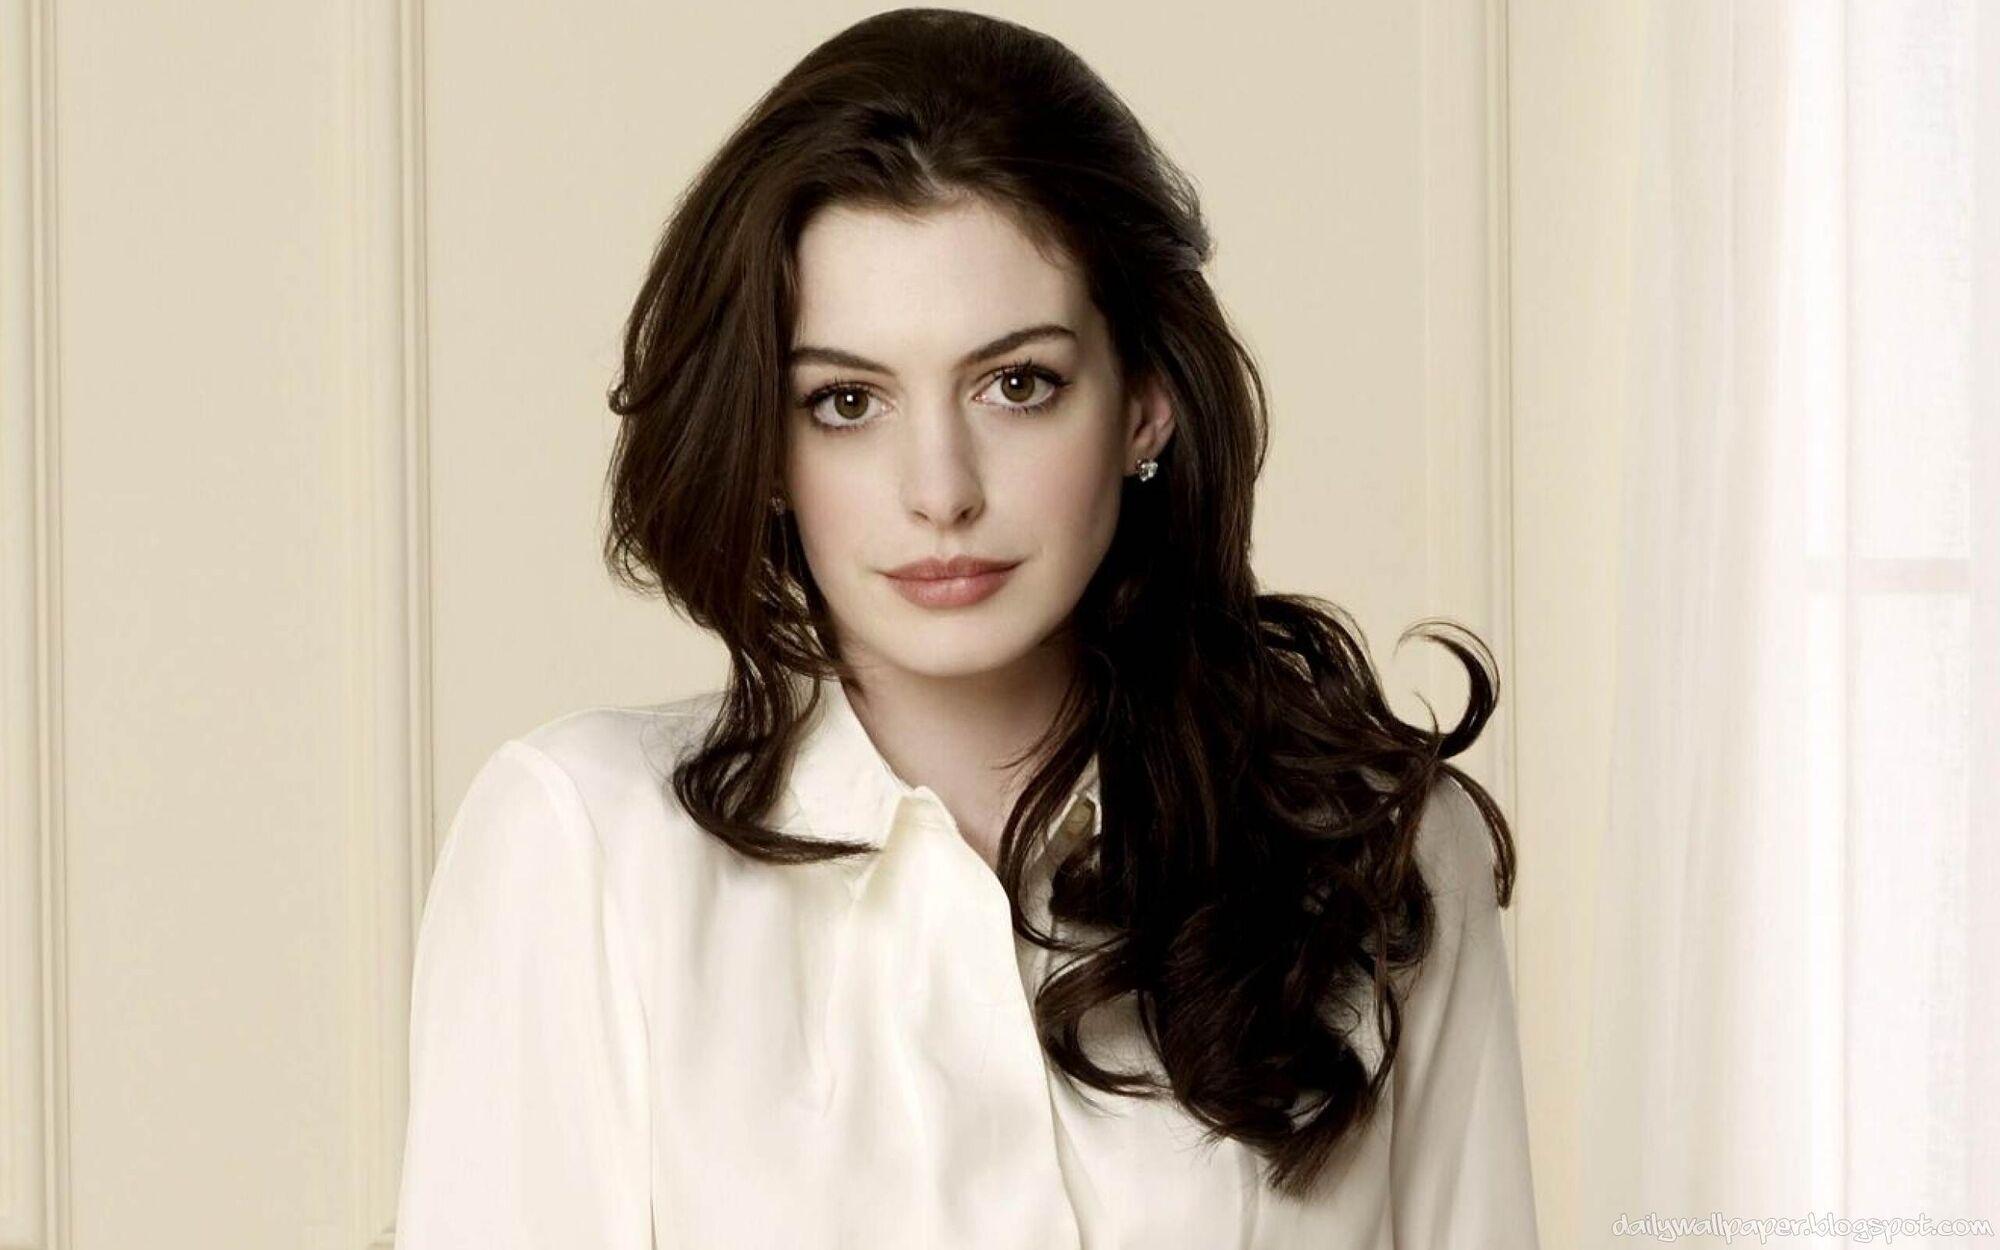 Anne Hathaway born November 12, 1982 (age 35)